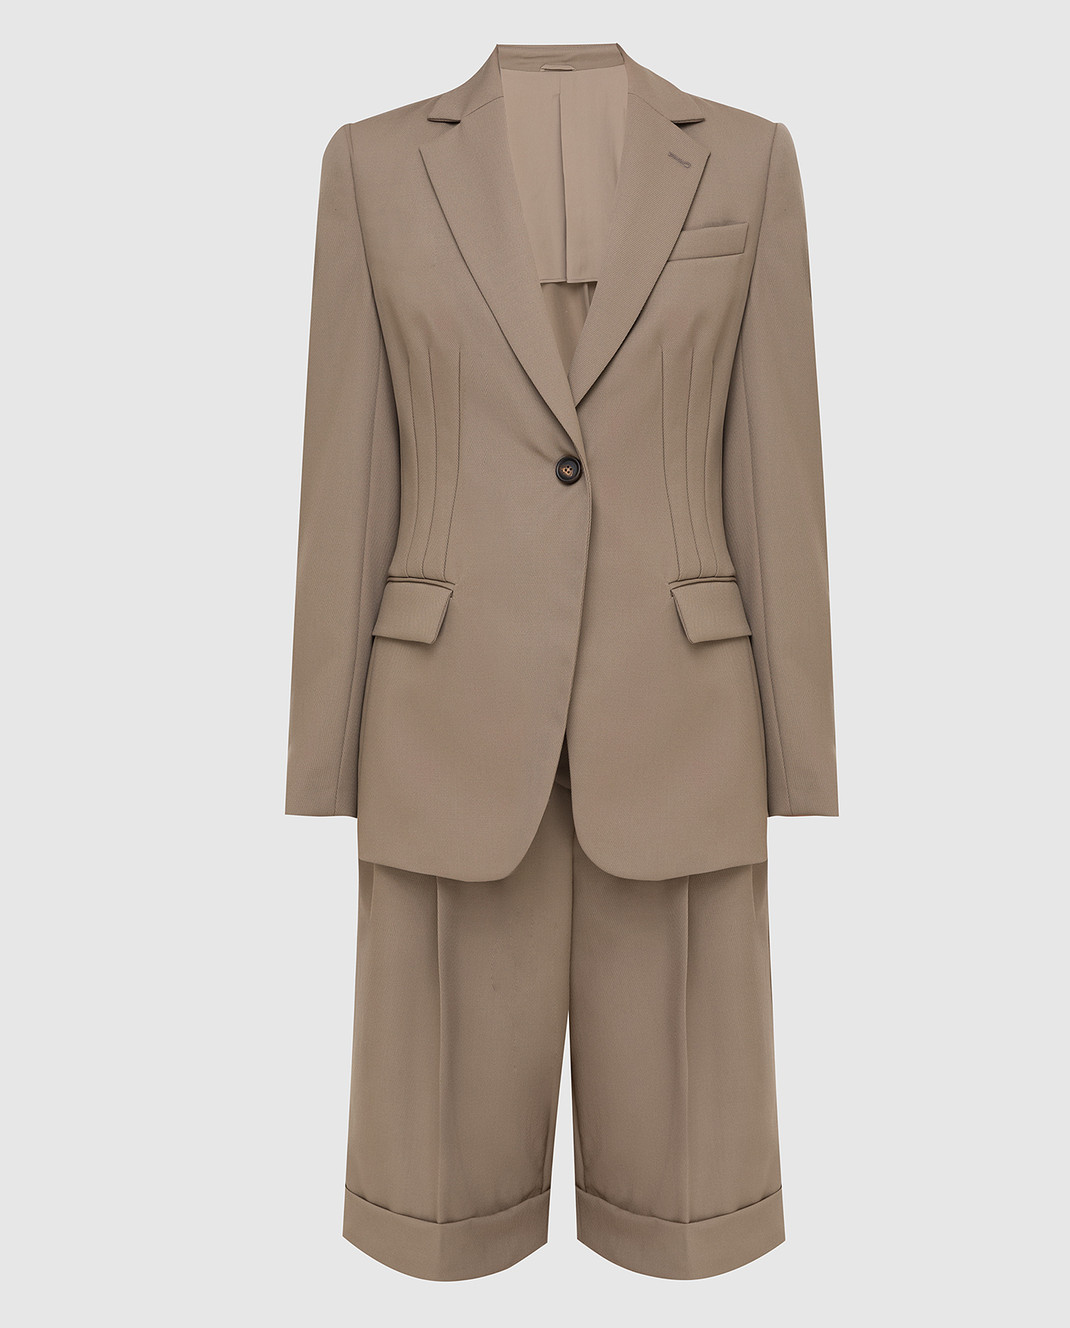 Brunello Cucinelli Бежевый костюм из шерсти изображение 1